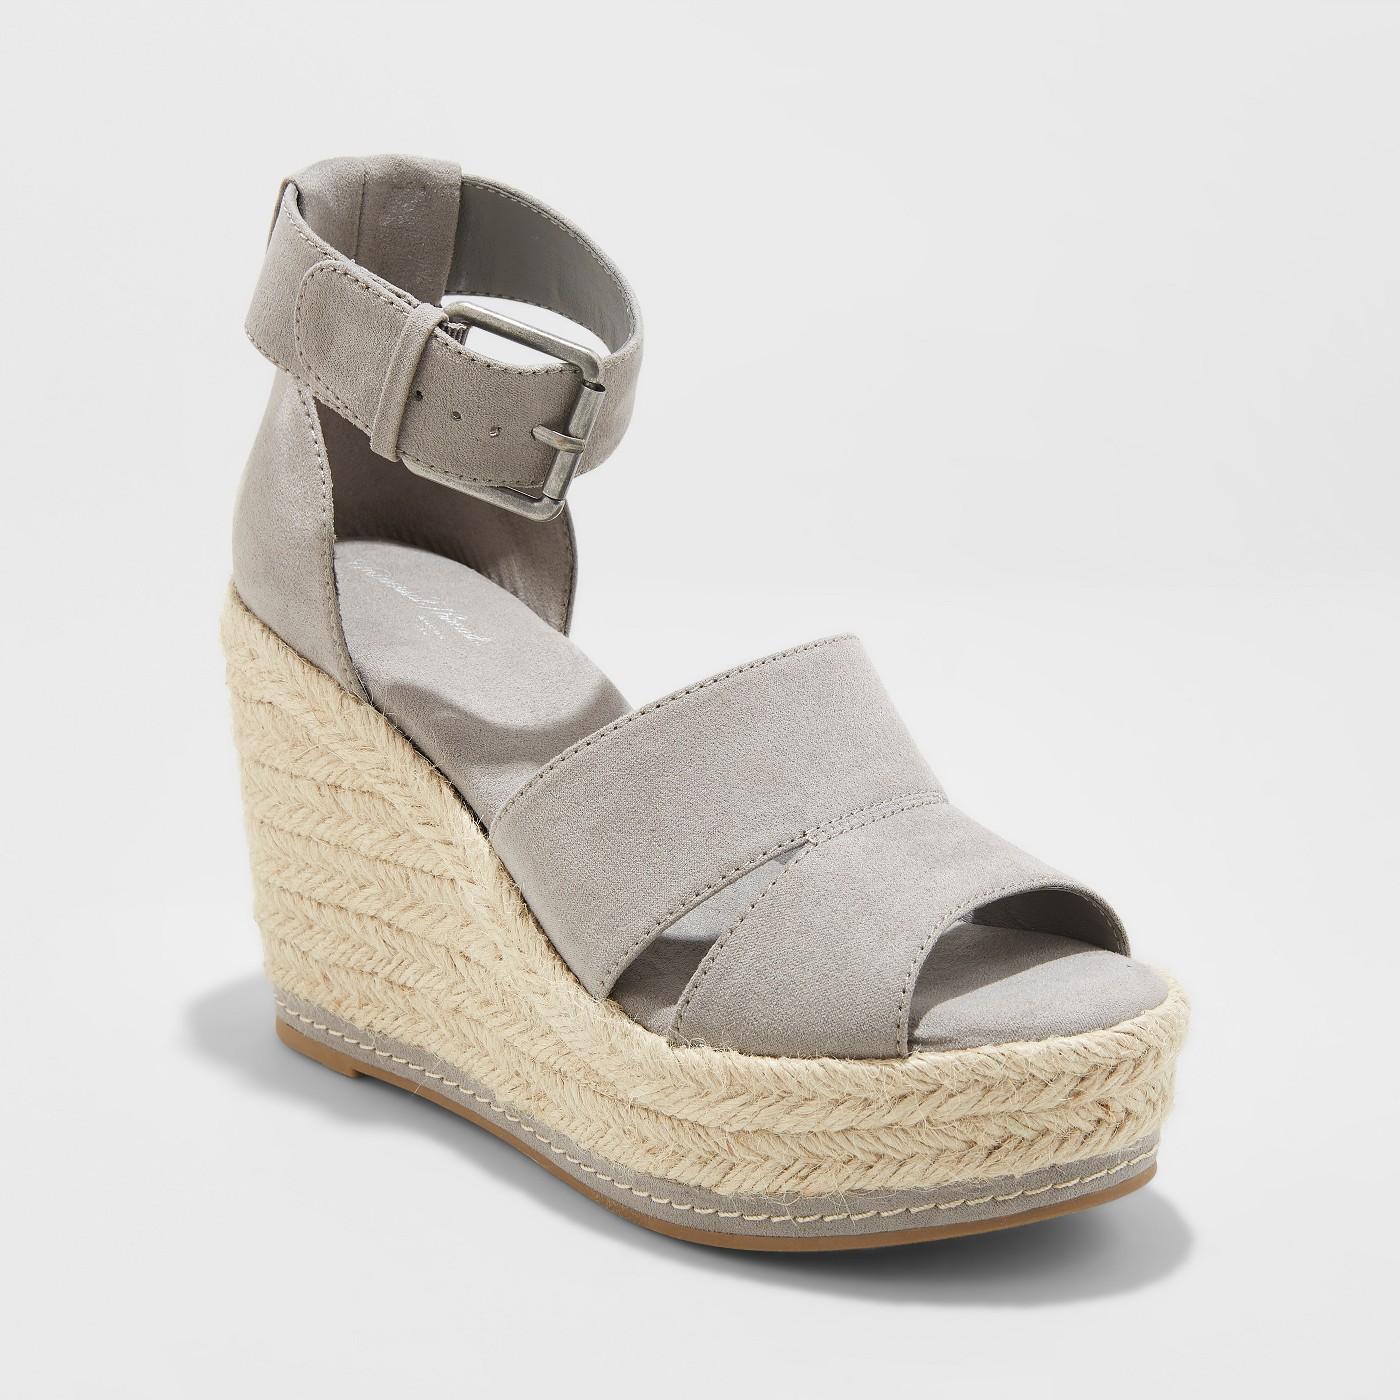 Women's Caroline Microsuede Ankle Strap Espadrille Wedge - Universal Thread™ - image 1 of 3